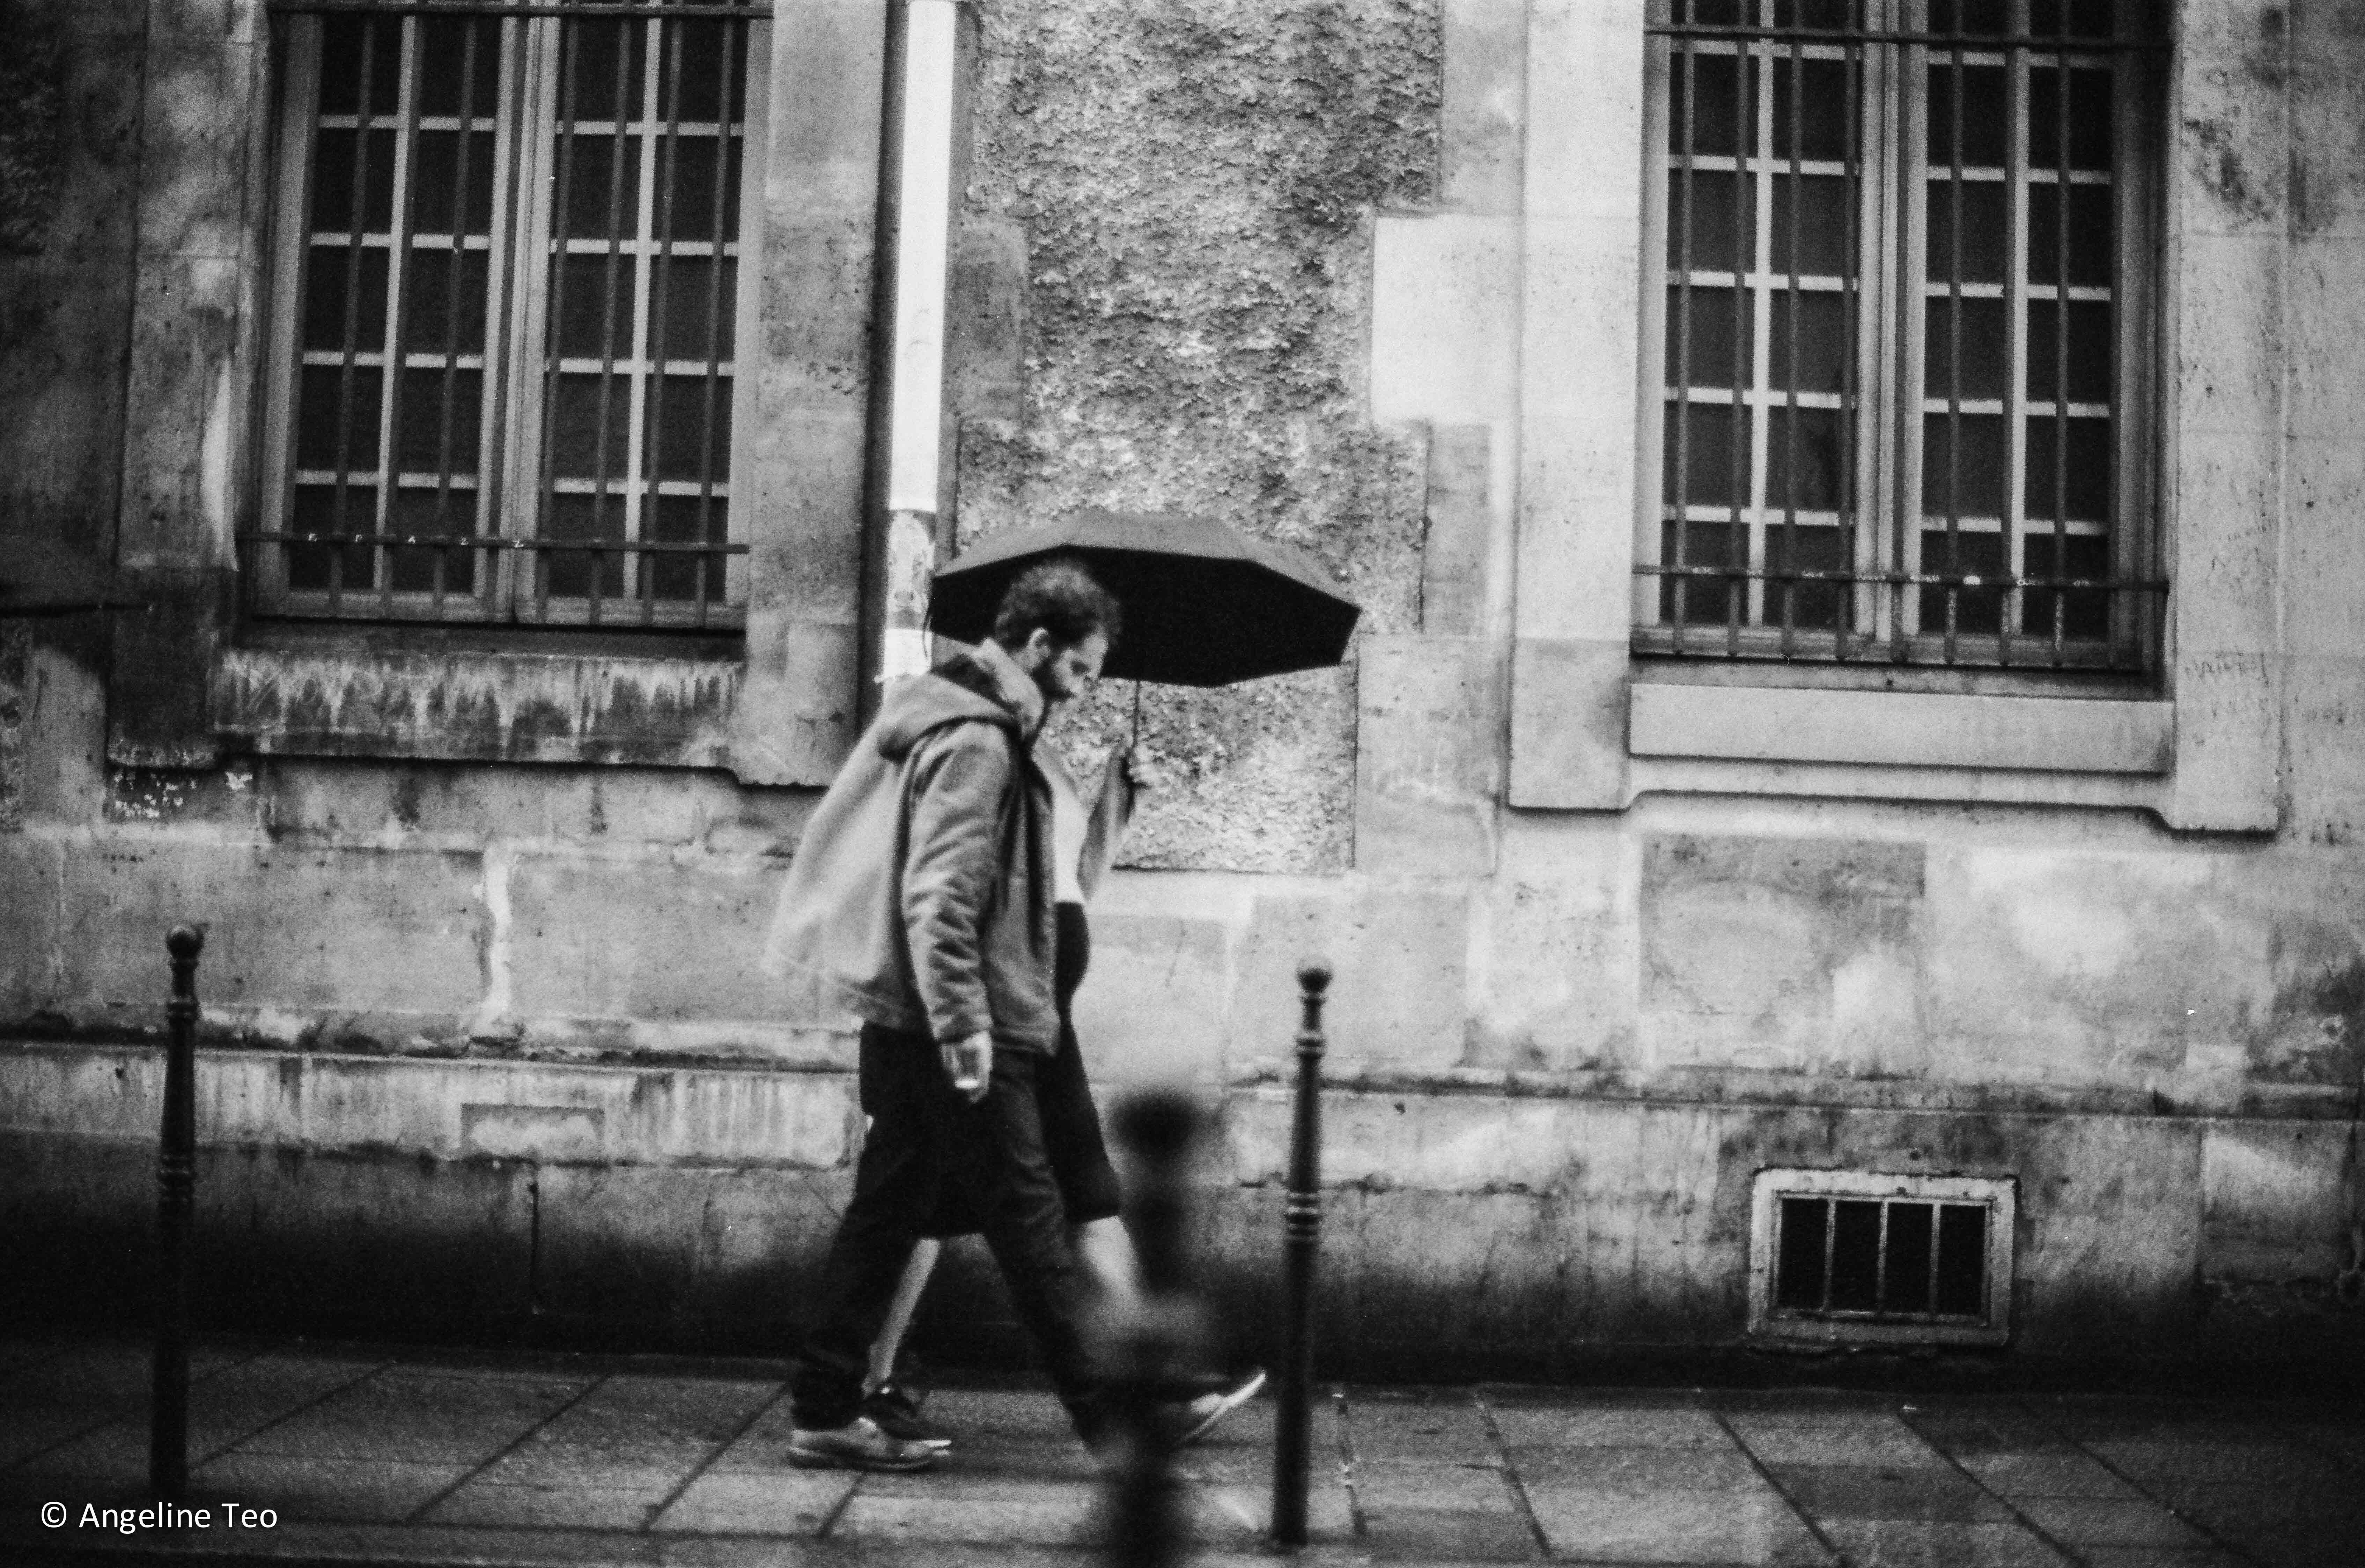 Strolling in The Rain